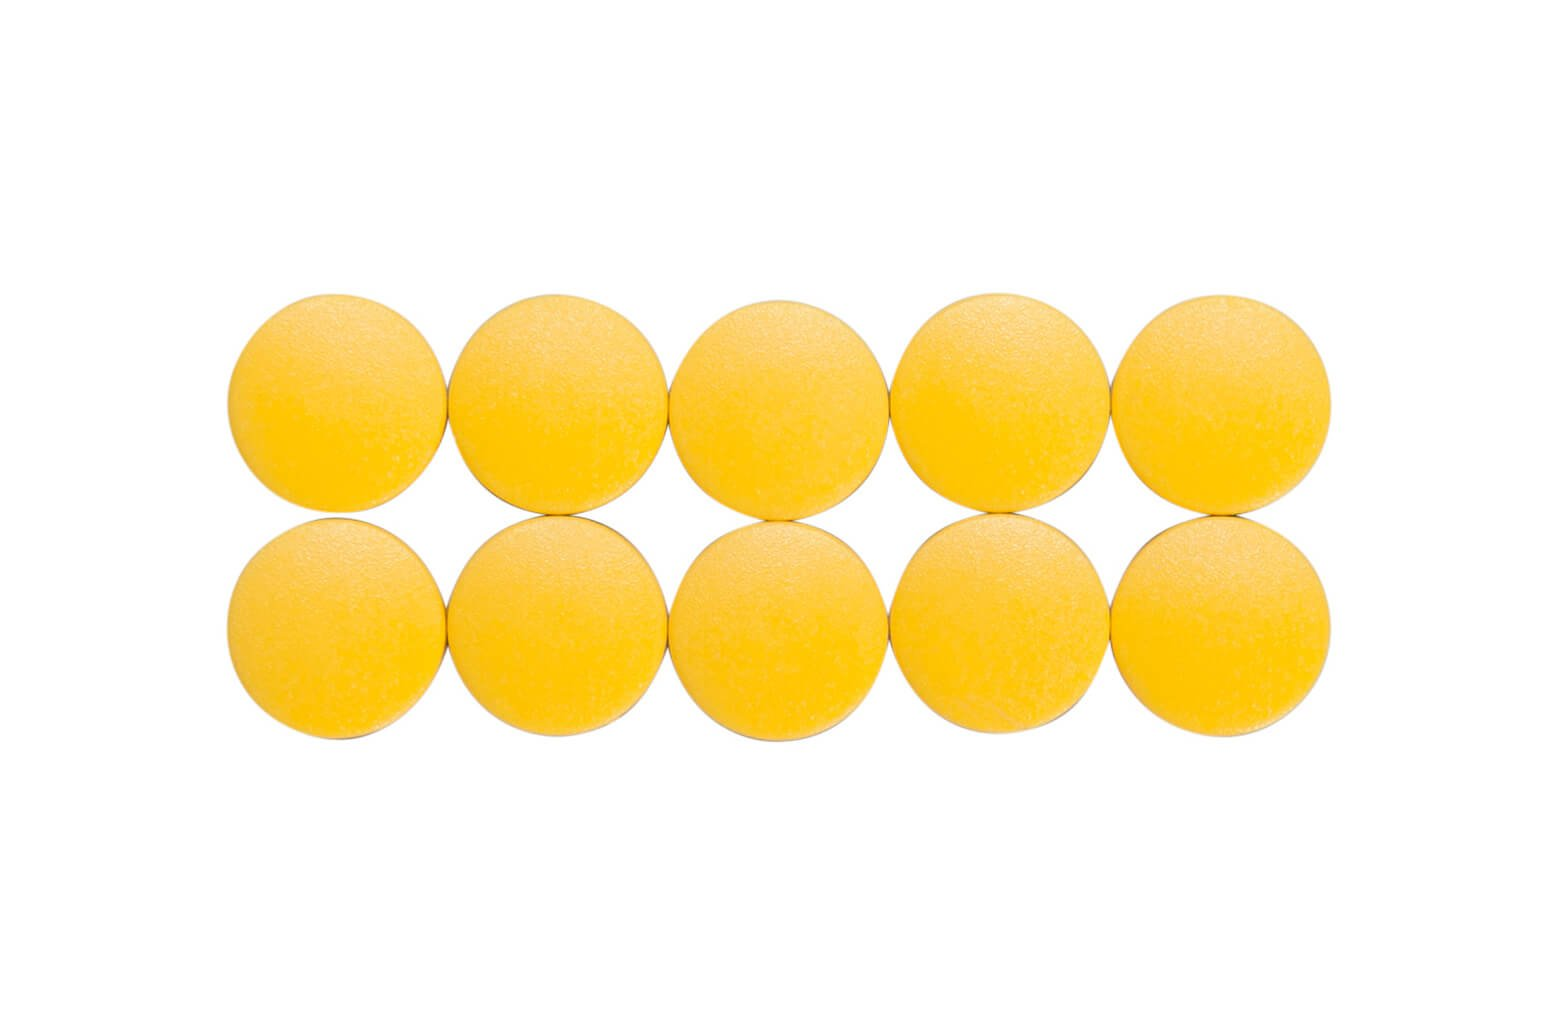 Magnet MAULsolid Ø 15 mm, 0,15 kg Haftkraft, 10 St/Ktn., gelb